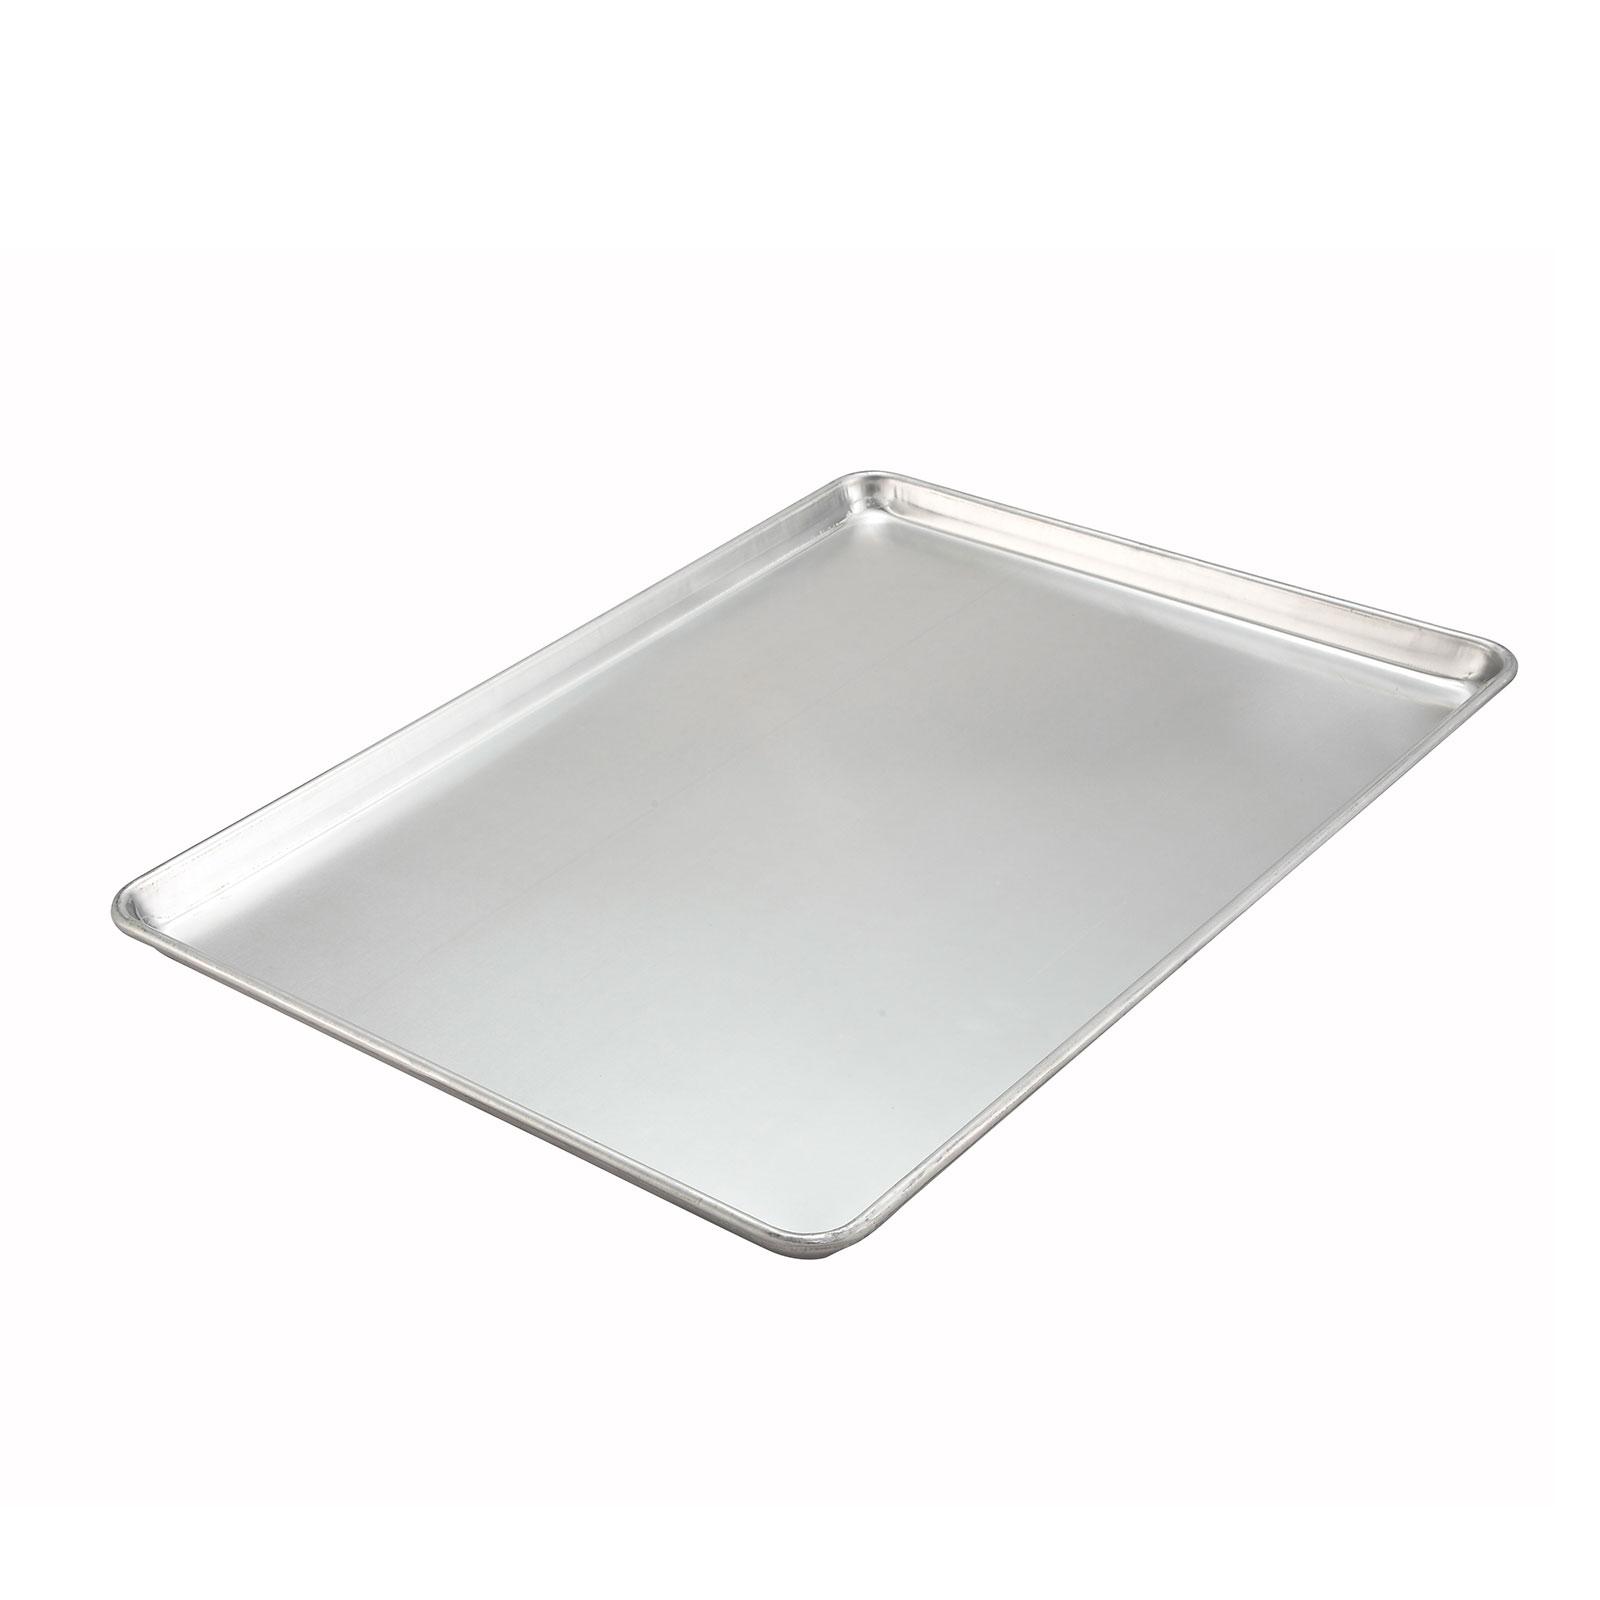 Winco 1826-E sheet pans